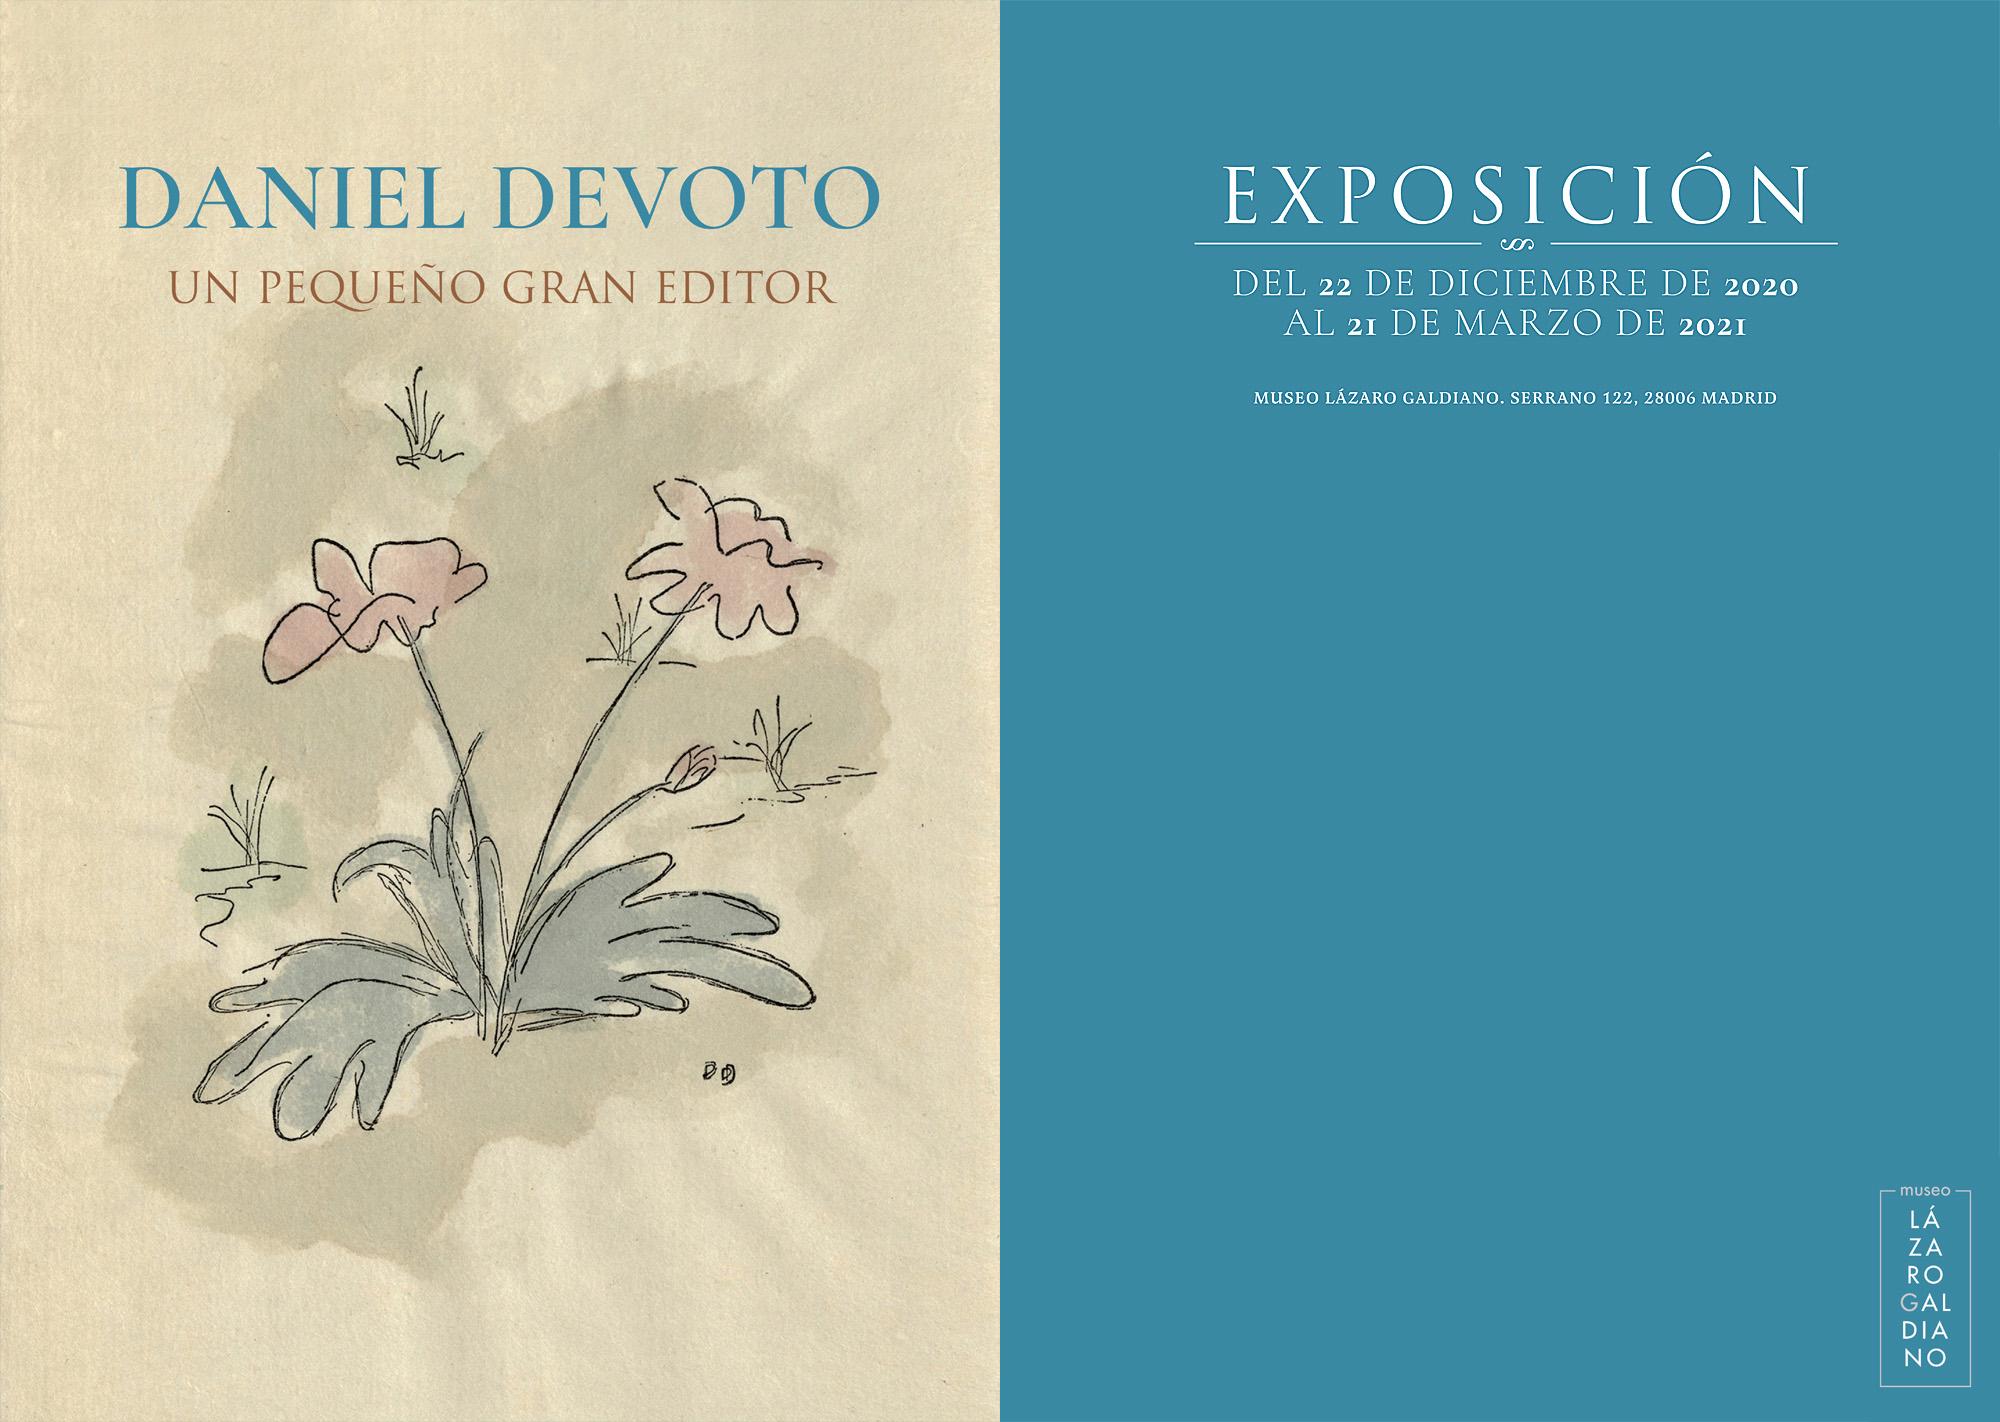 Daniel Devoto, Museo Lázaro Galdiano